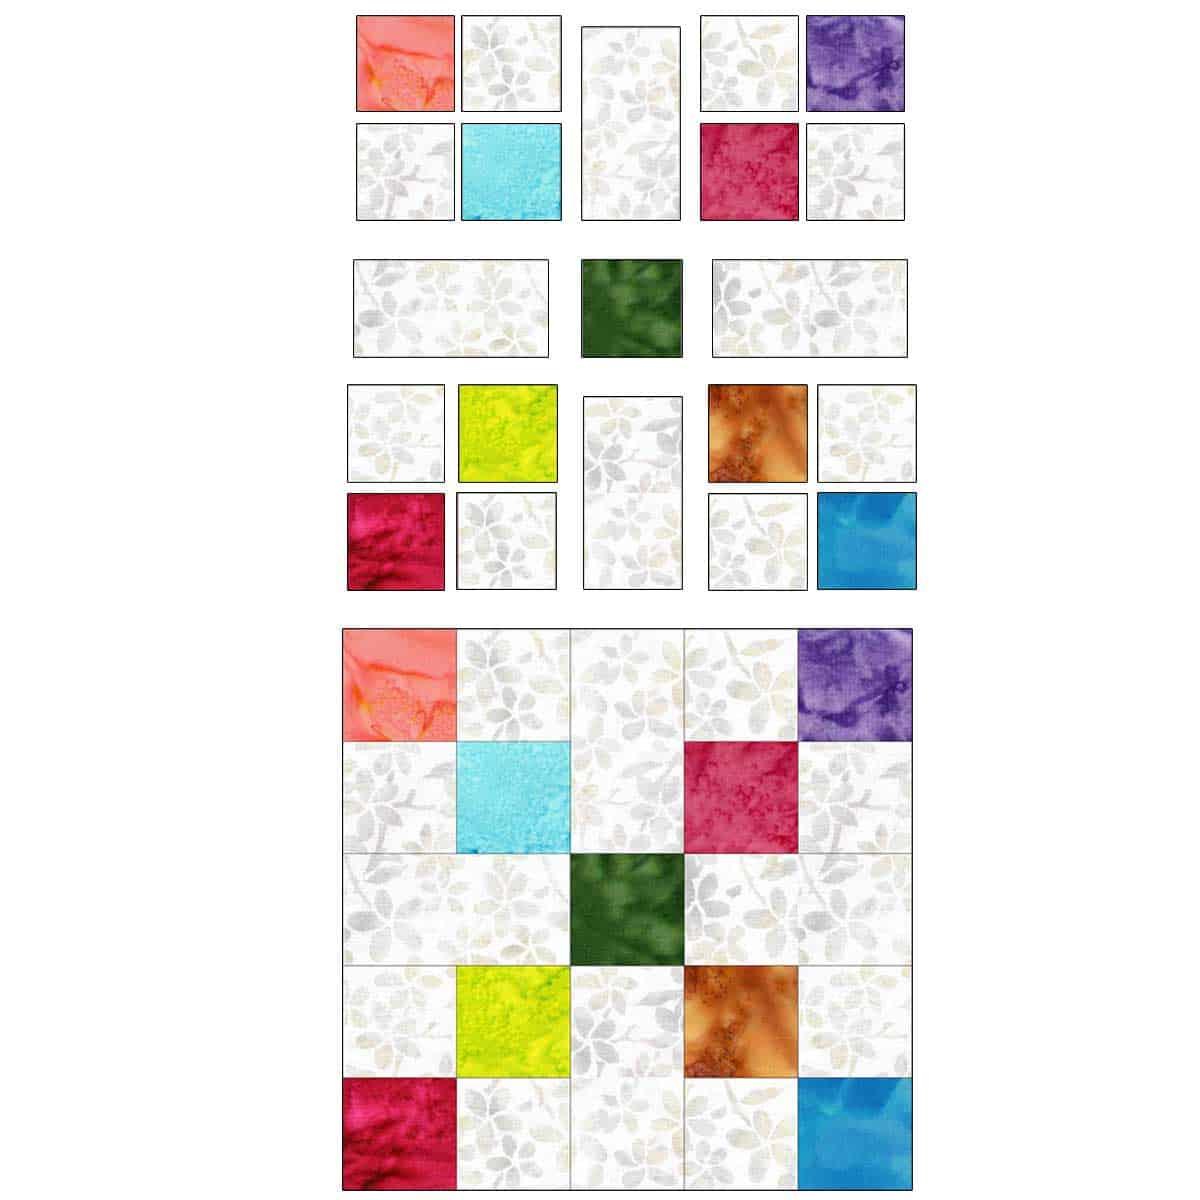 Scrappy quilt block number 1